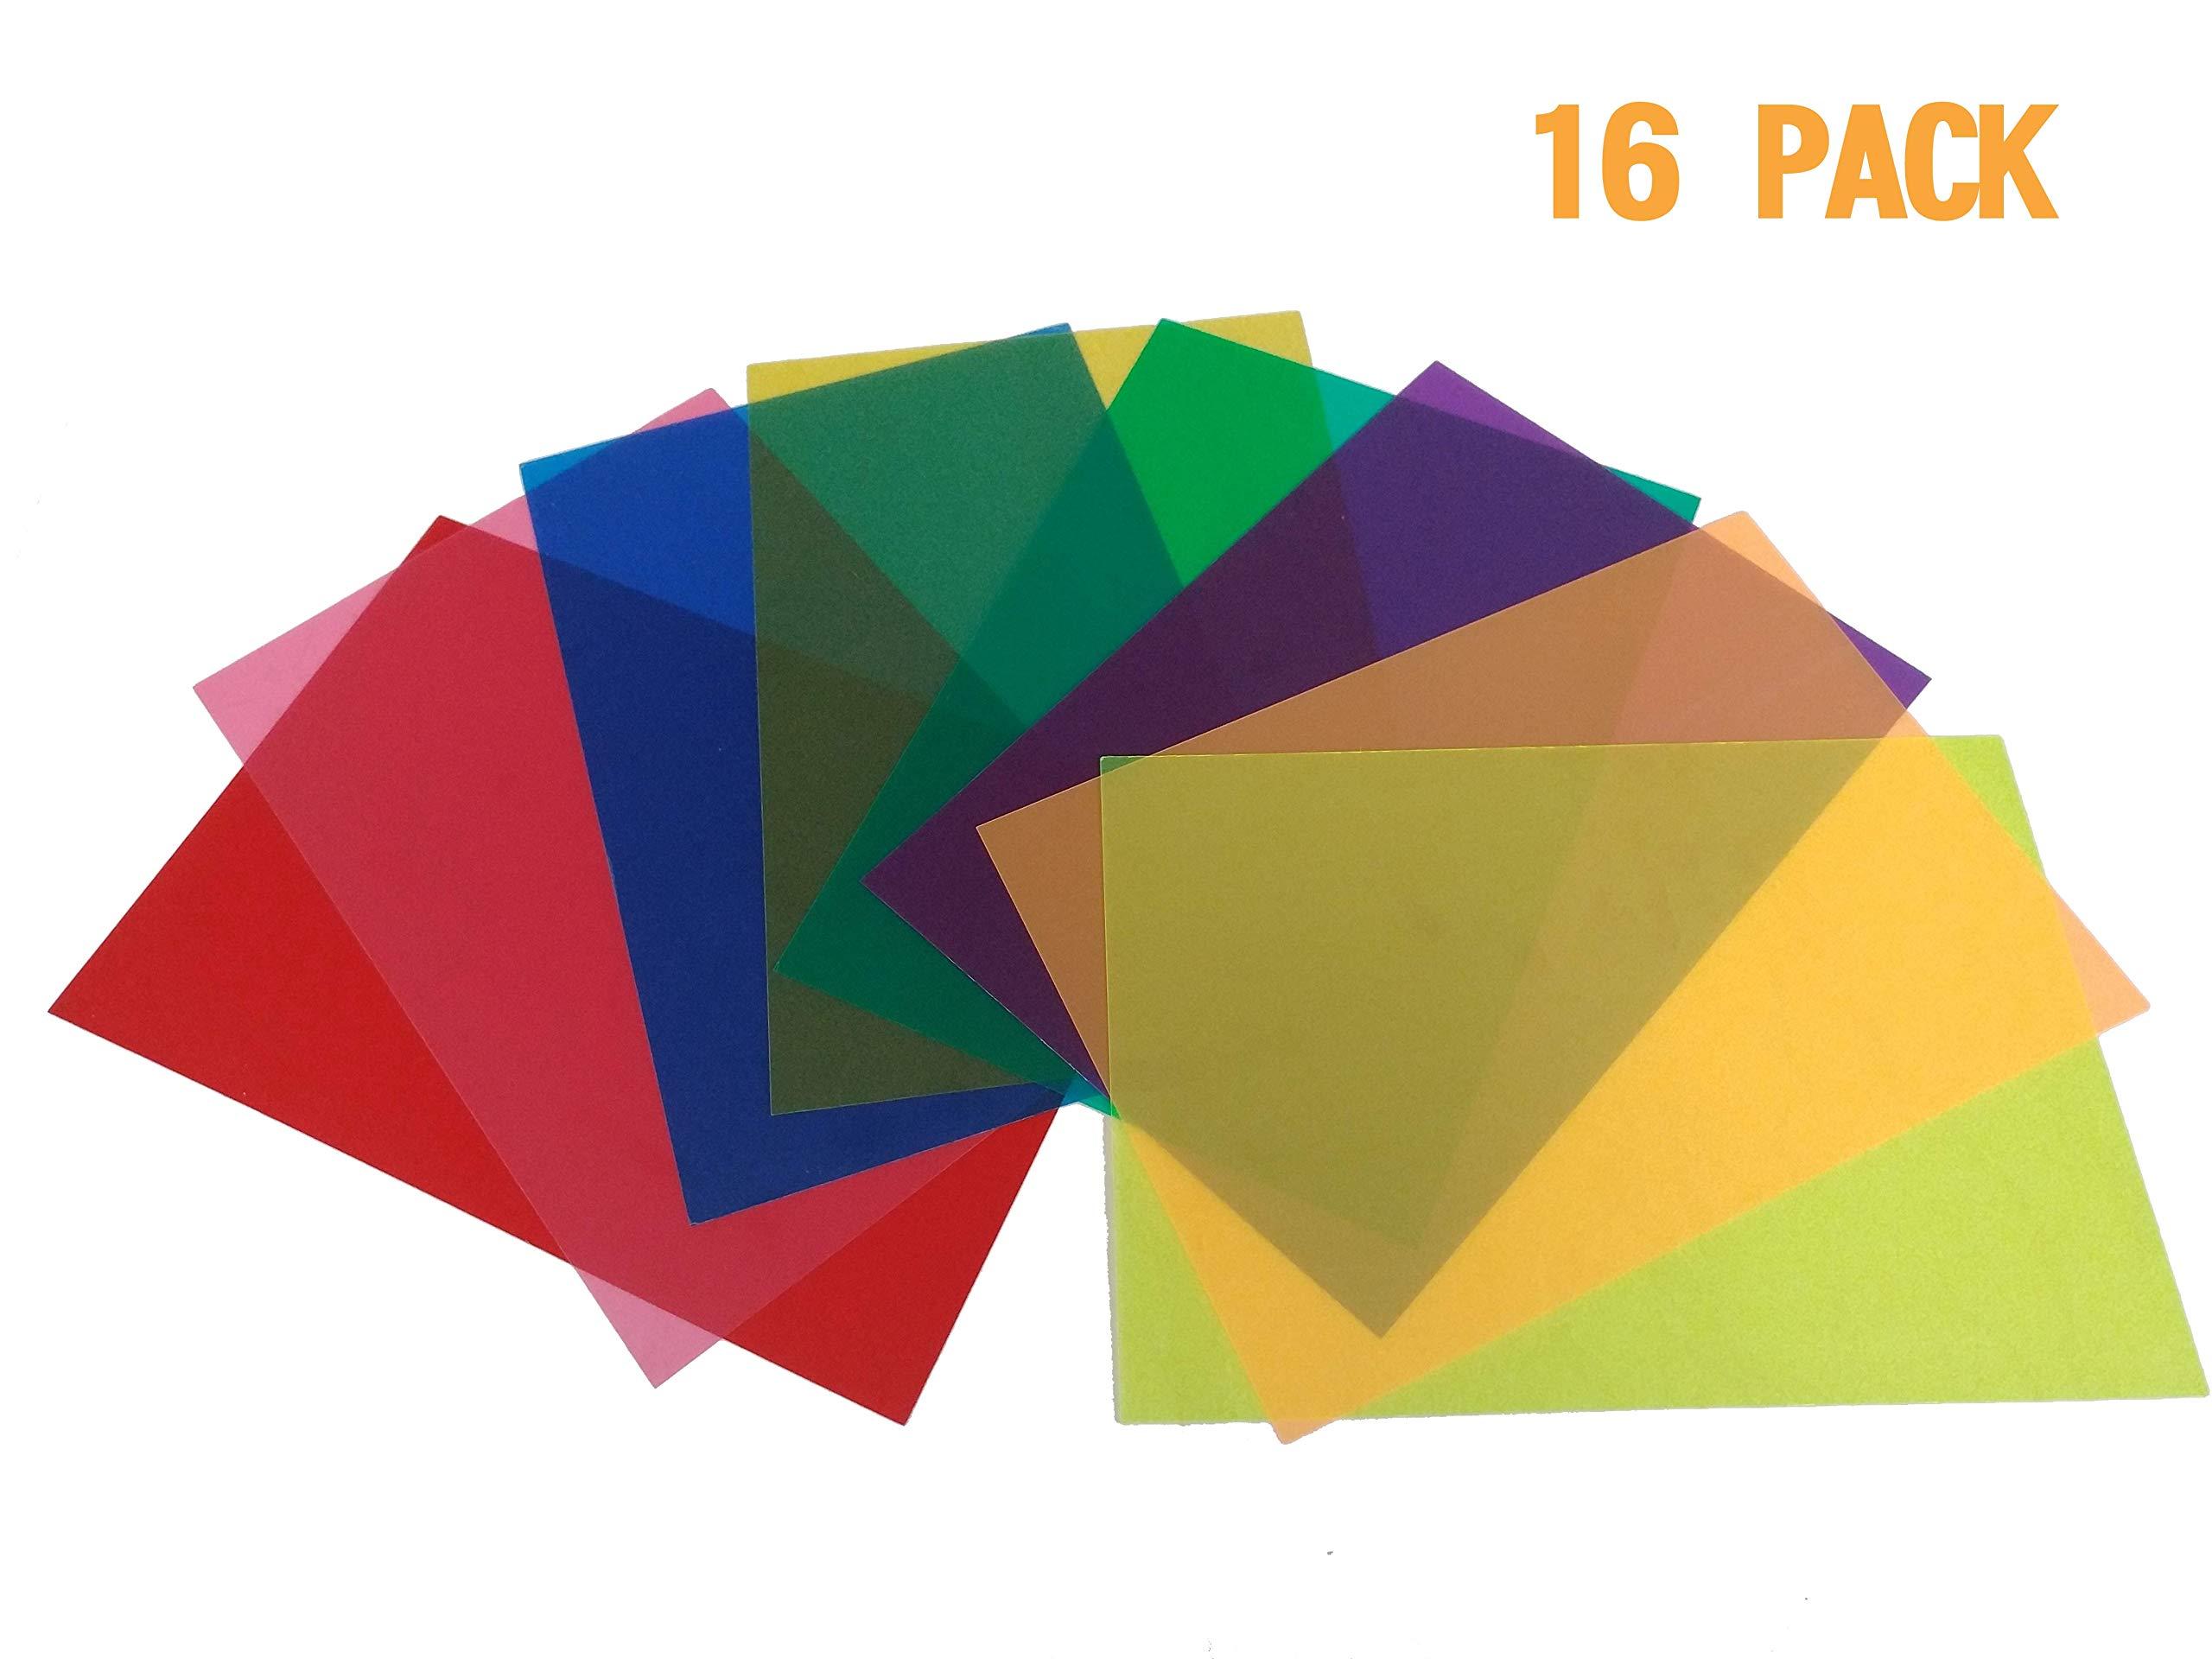 Best Starloop 16 Pack Light Gels Colored Overlays Transparency Color Film Plastic Sheets Correction Gel Light Filter Sheet, 8.5x11 Inch,8 Assorted Colors 2 Sets